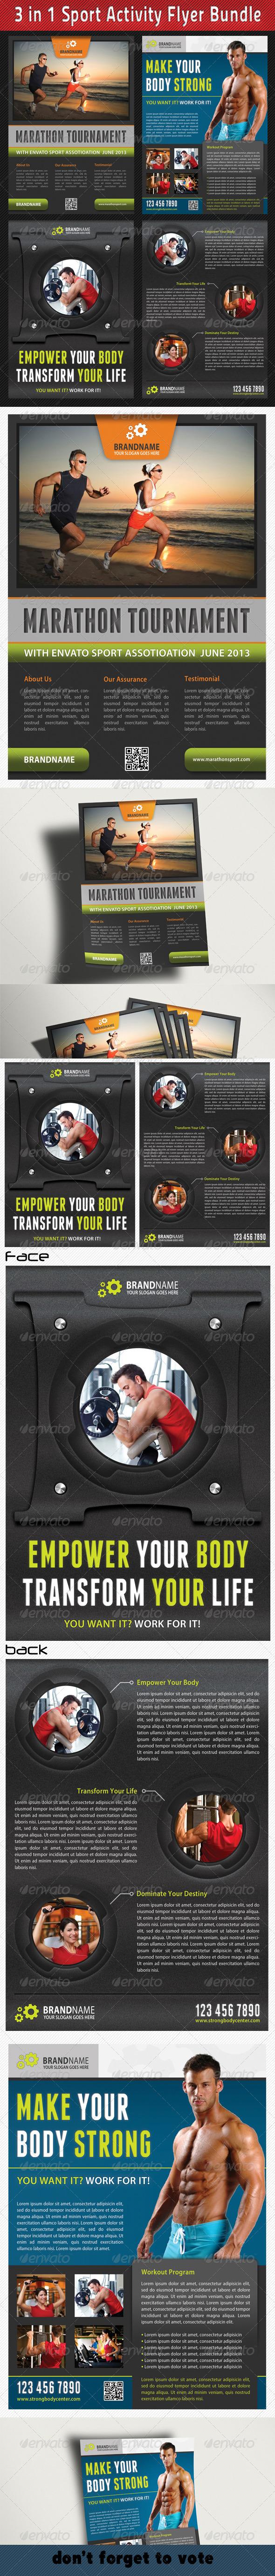 GraphicRiver 3 in 1 Sport Activity Flyer Bundle 01 6713887